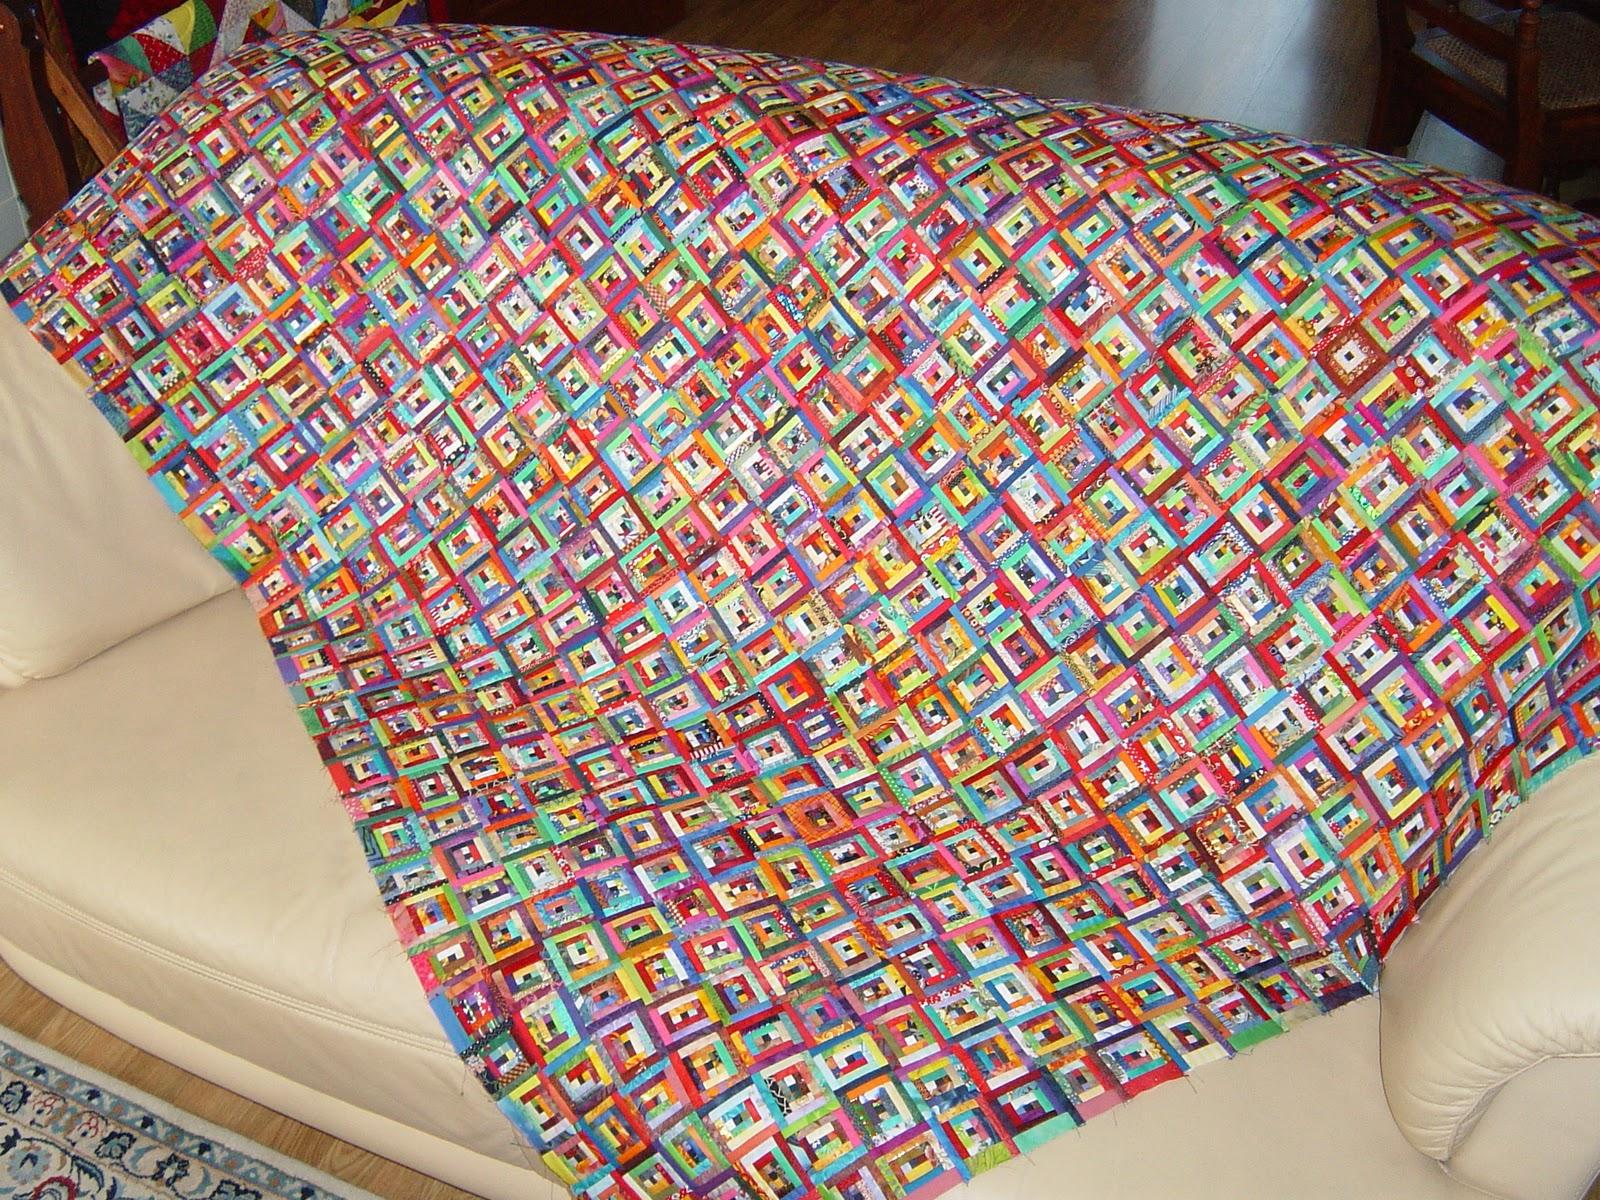 Hobbyshop fugeltsje oktober 2011 for Quilt maken met naaimachine